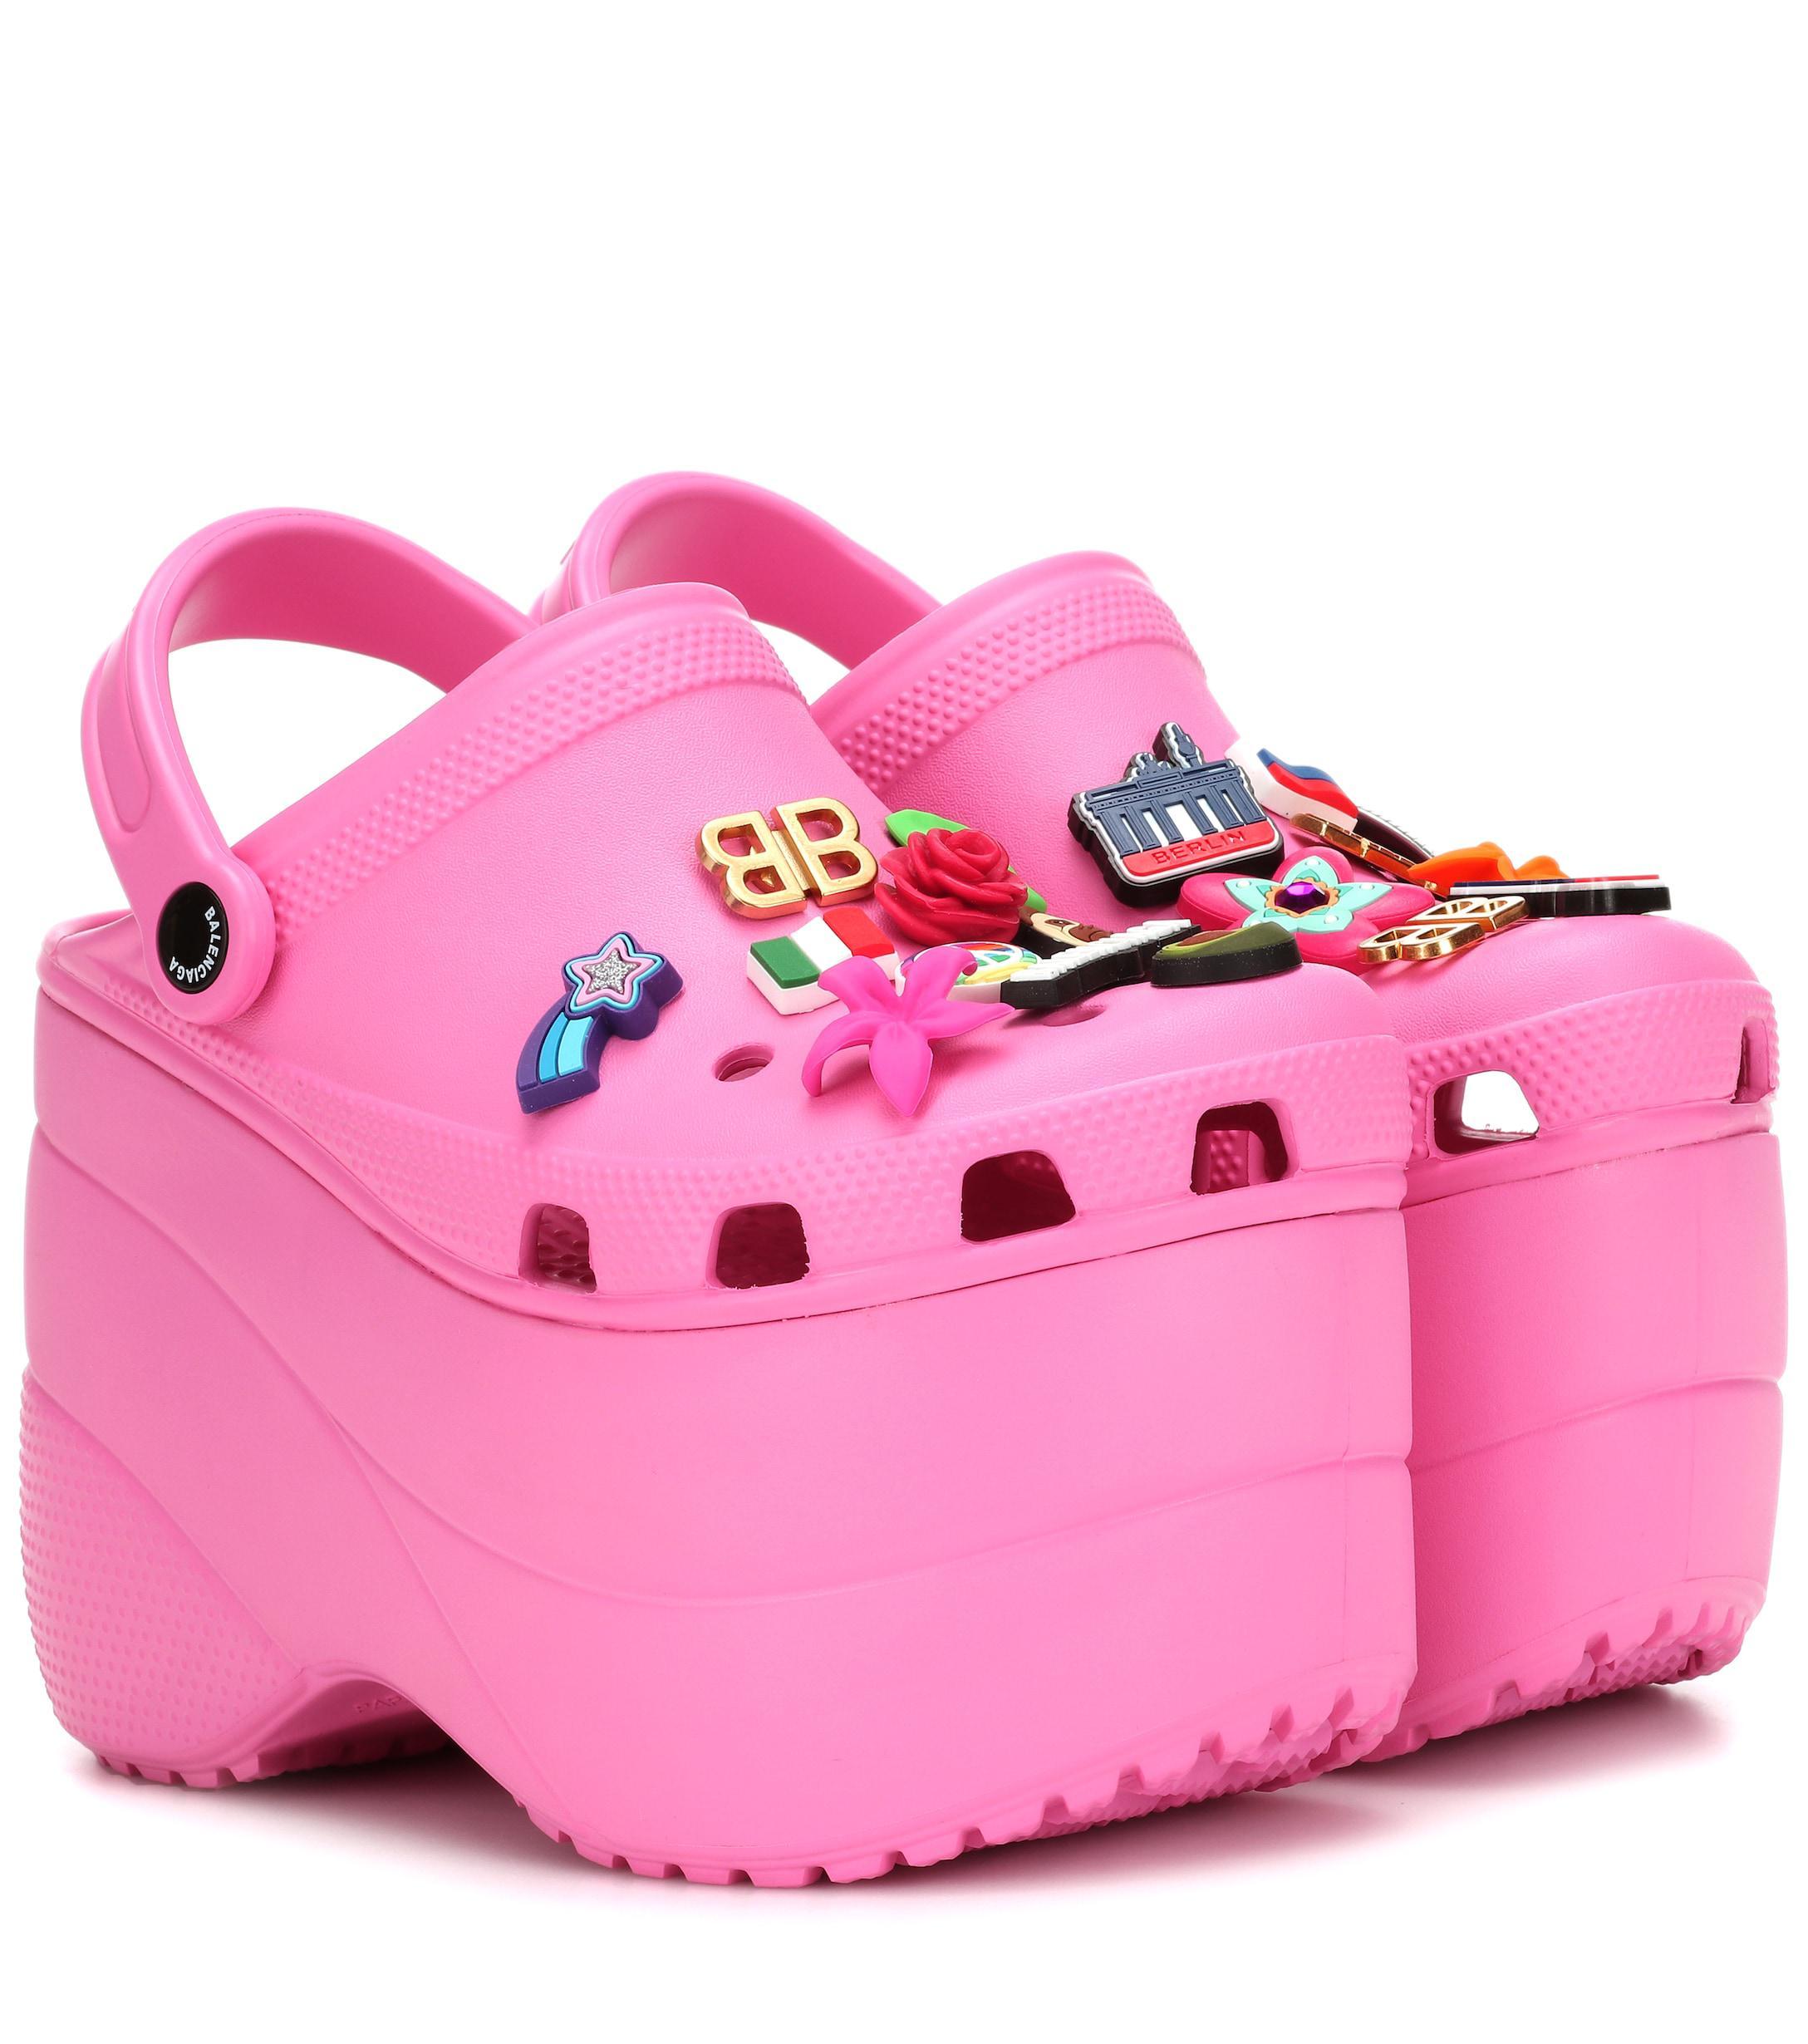 585f36888f95a3 balenciaga platform crocs price